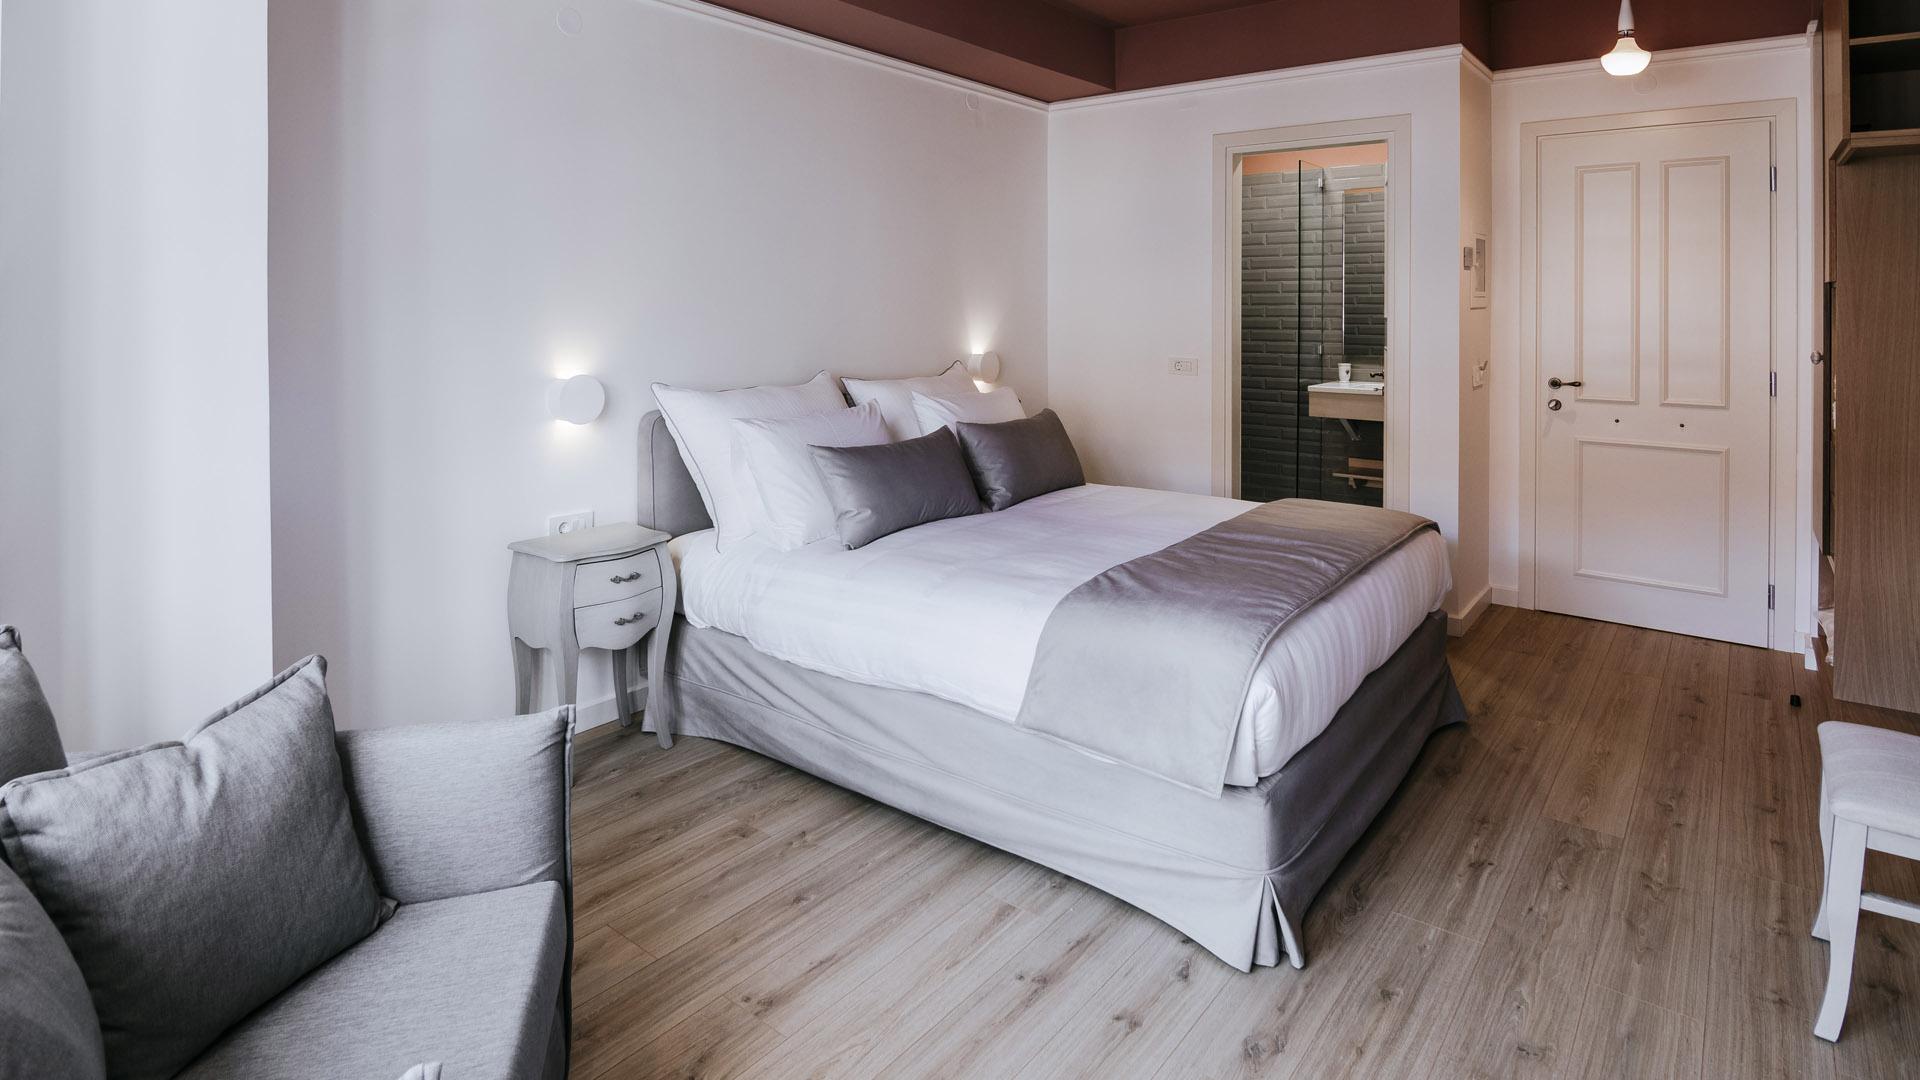 http://itskale-hotel.gr/demo/wp-content/uploads/2013/10/DSC_5964.jpg